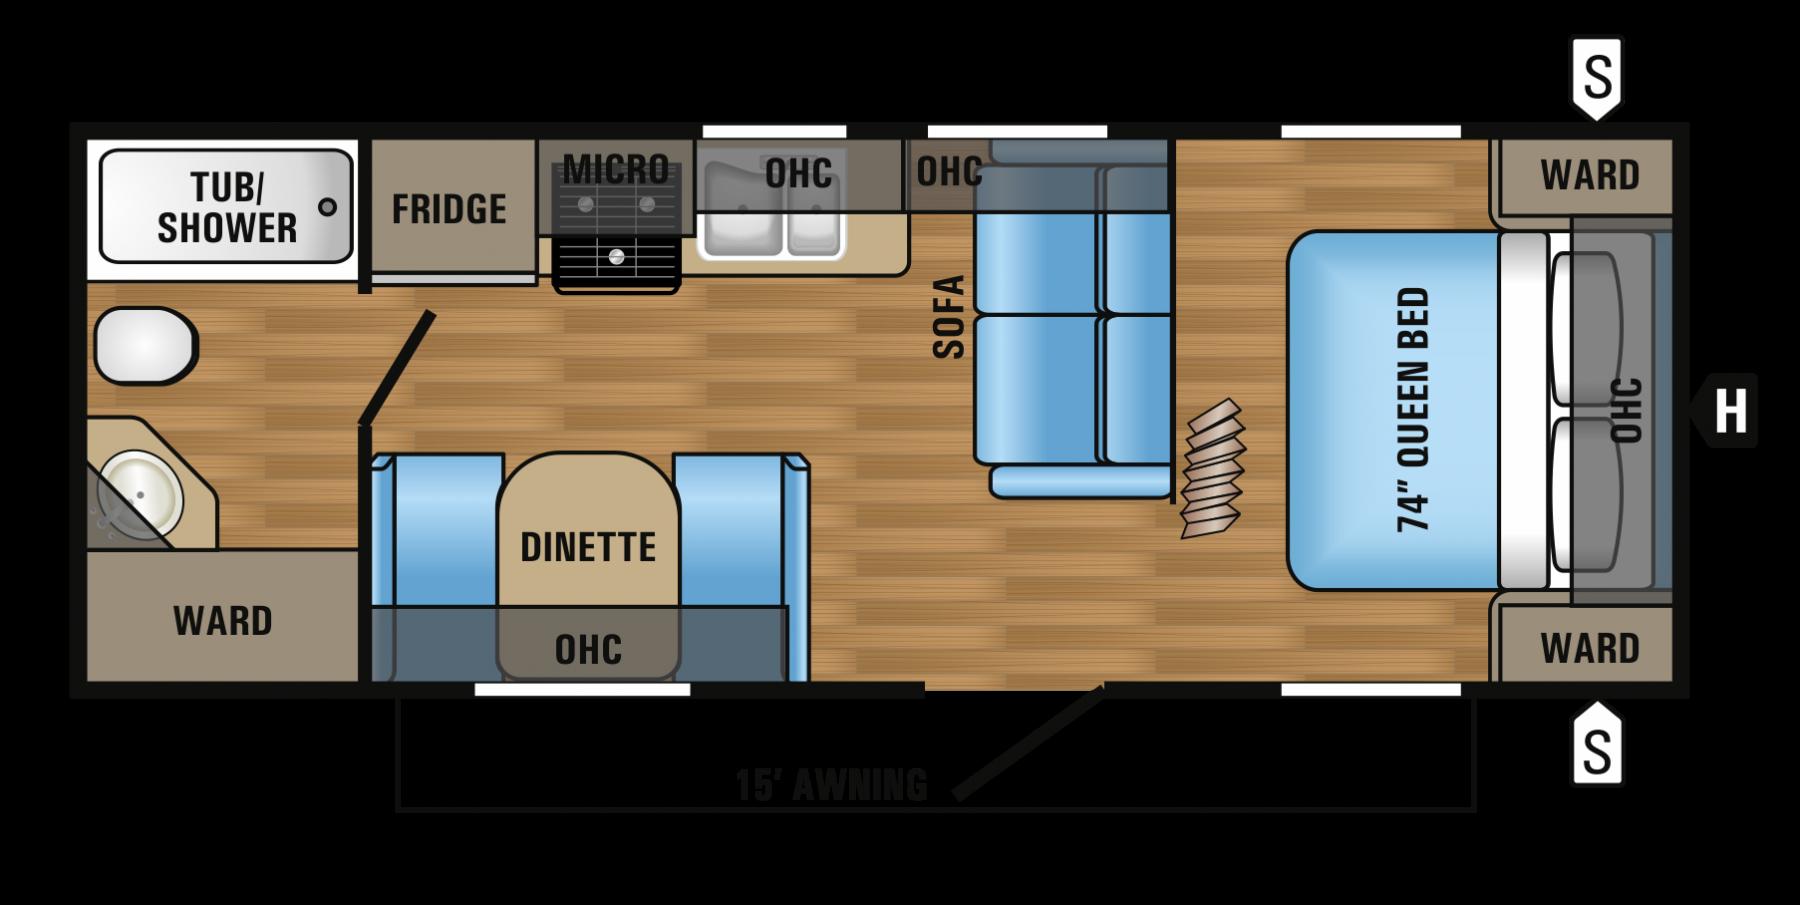 2017 JAYCO JAYFLIGHT 23FB (couples) Floorplan